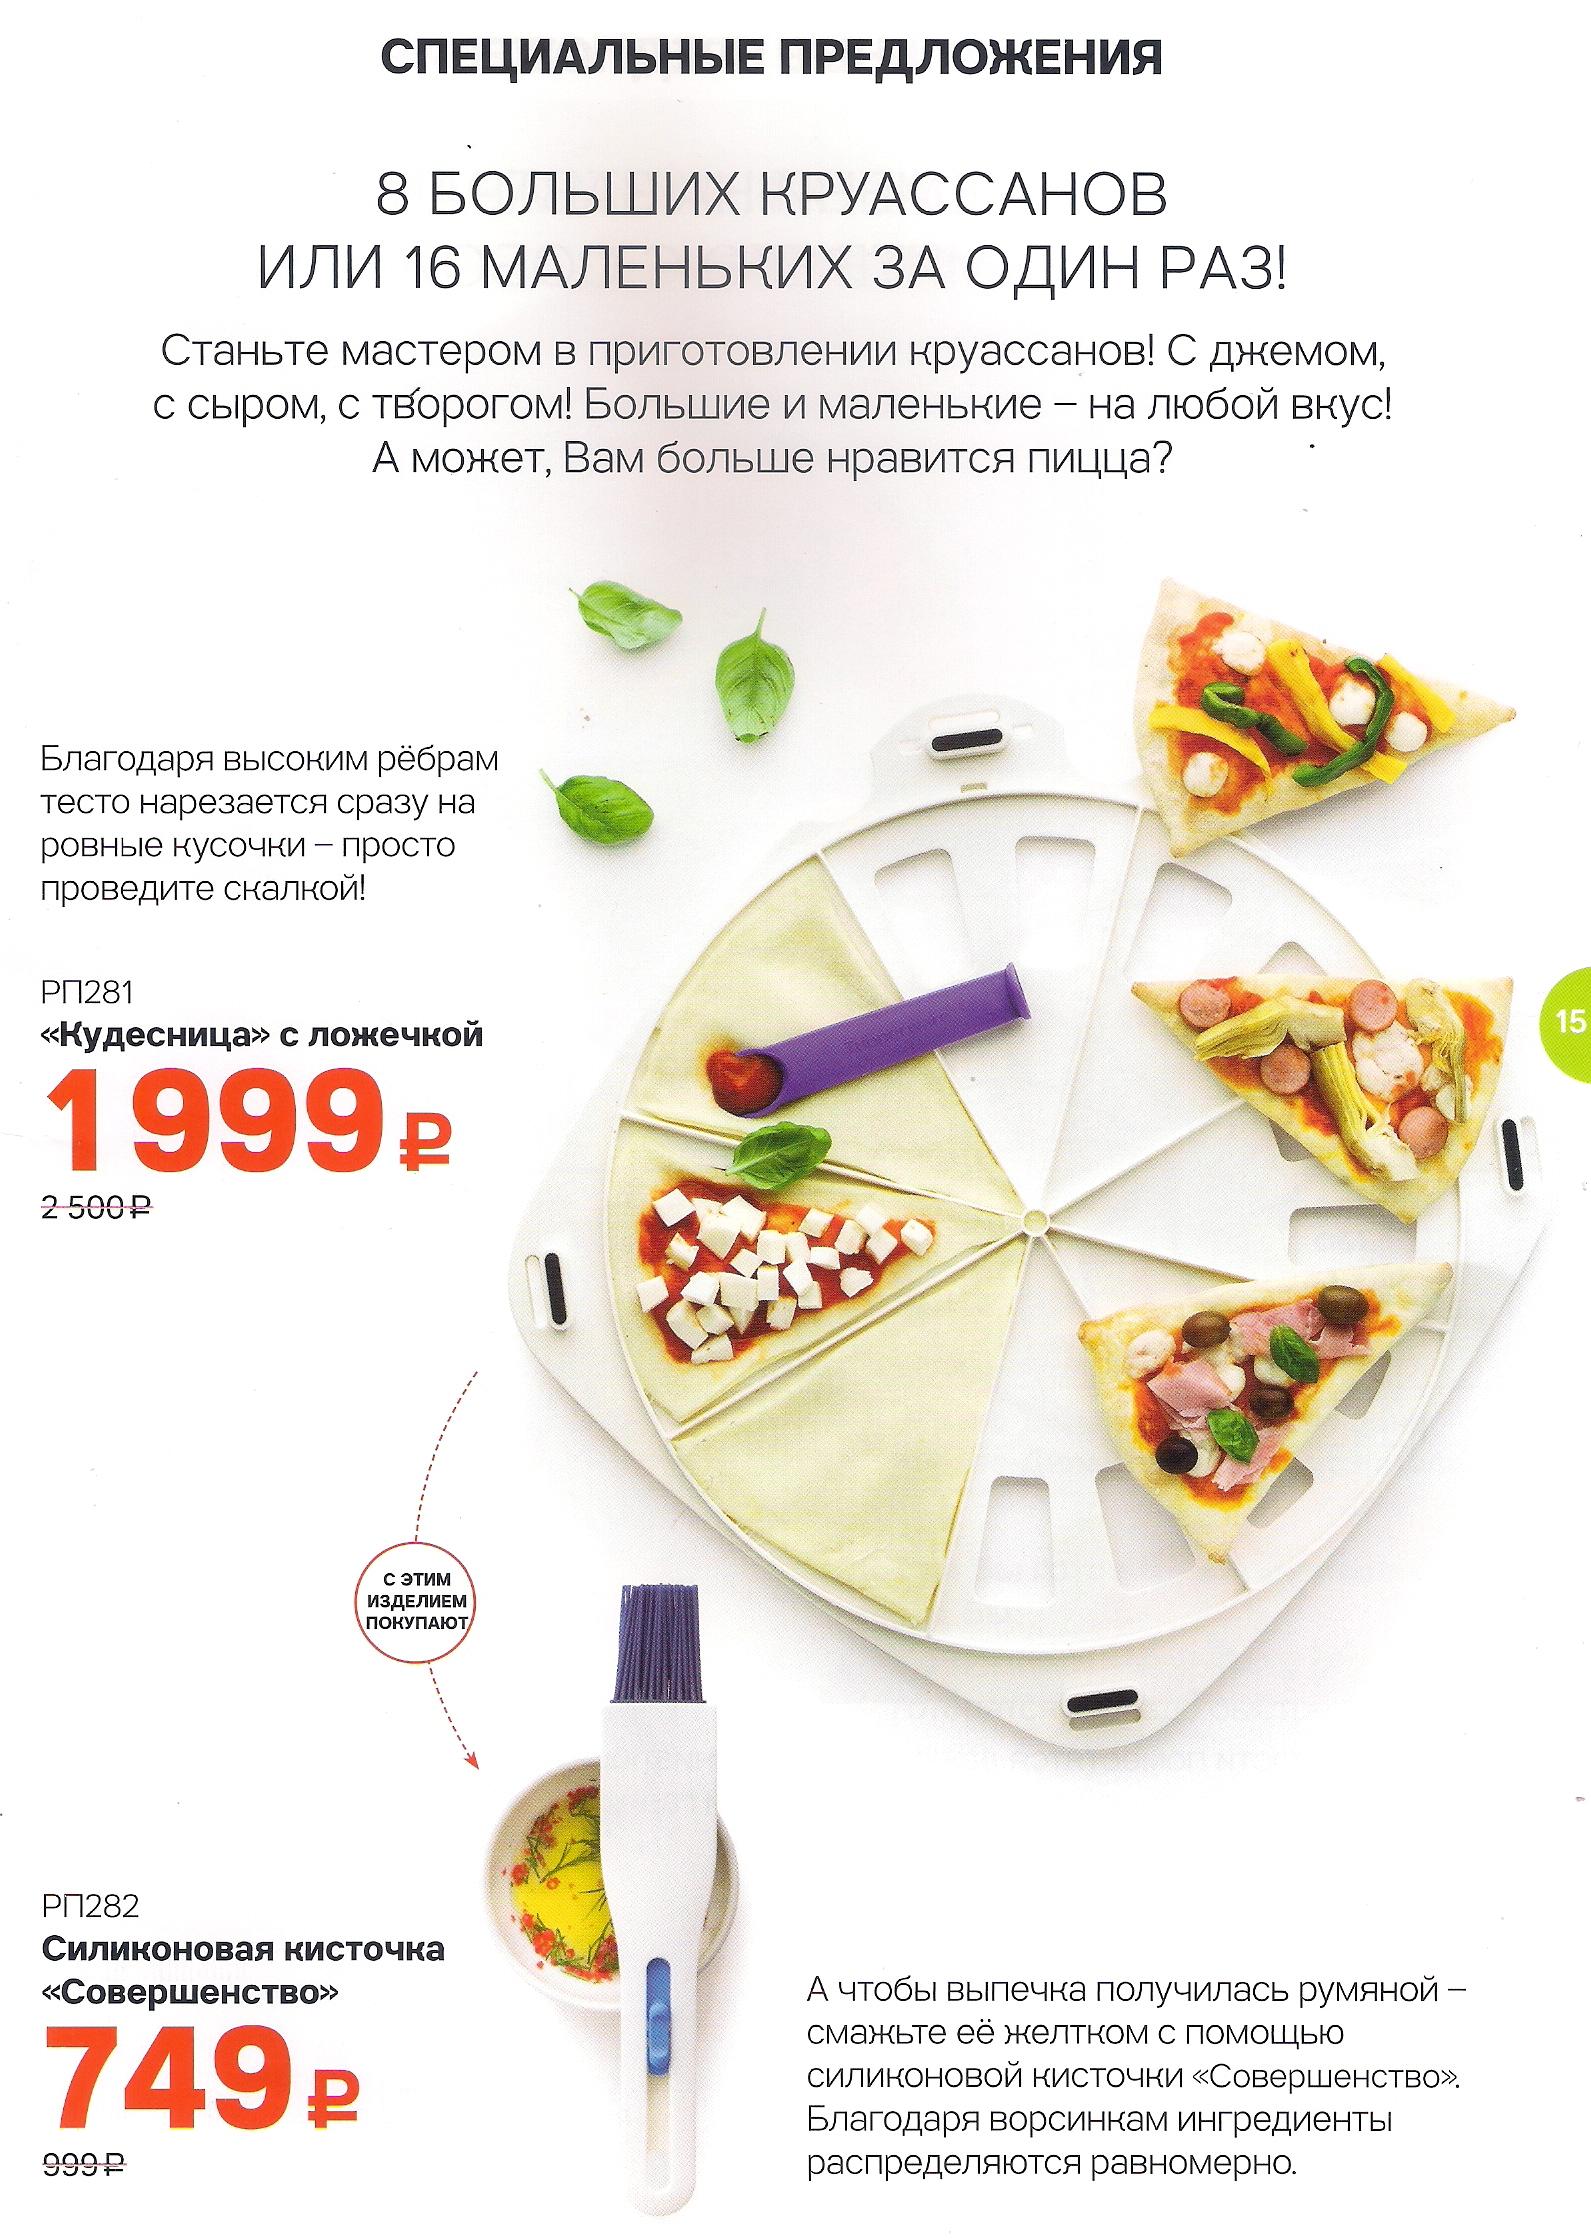 https://tupperware-online.ru/images/upload/14о.jpg